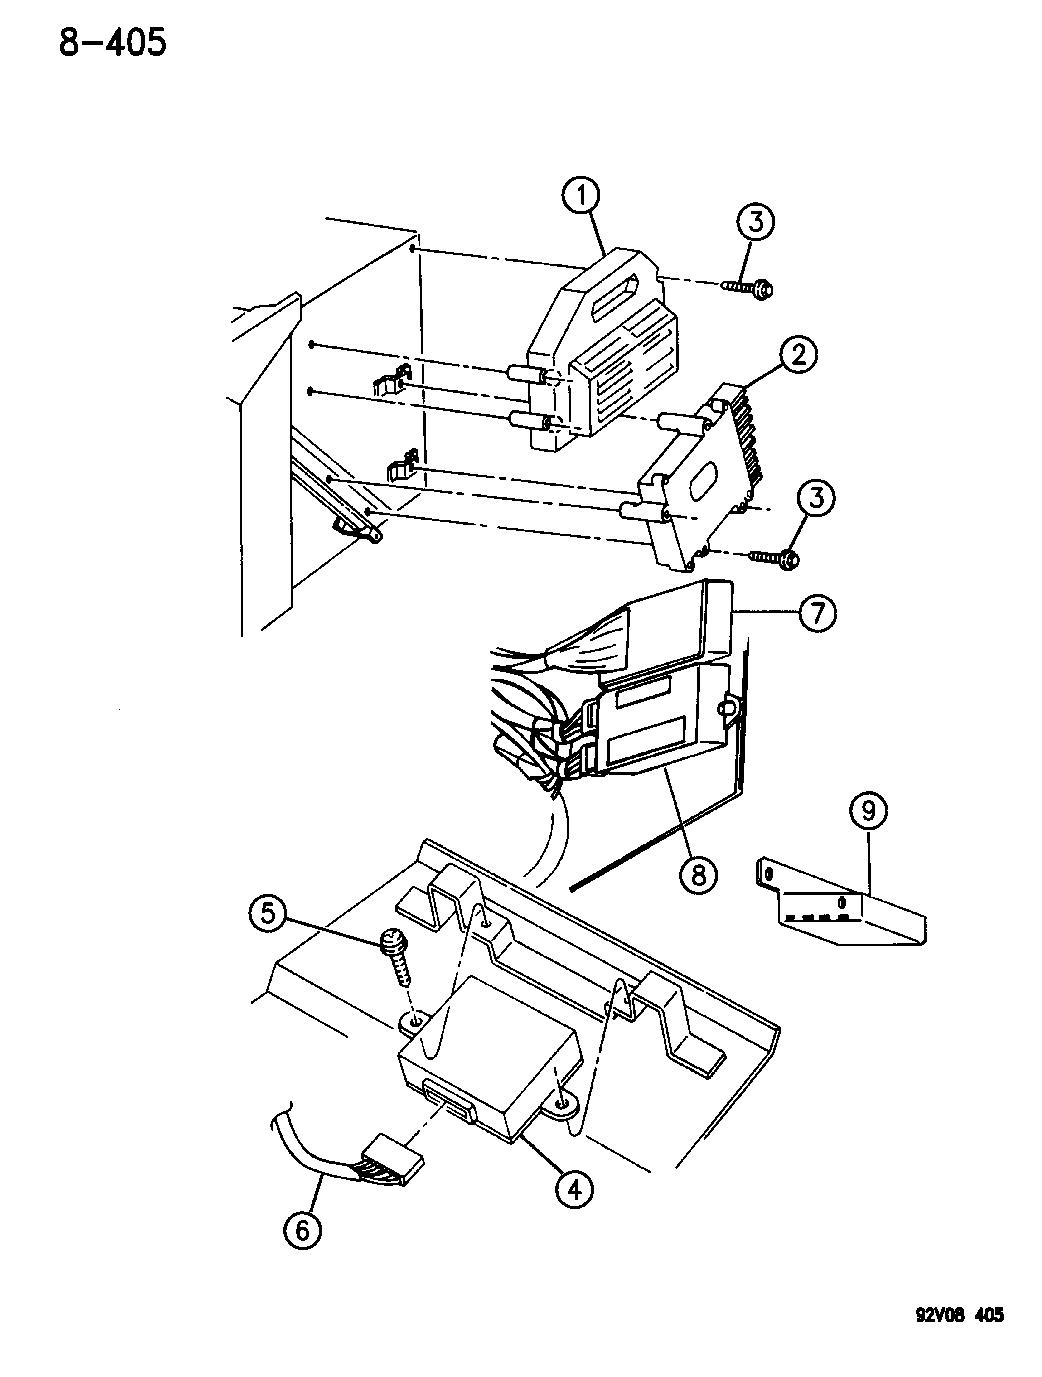 1994 Dodge Viper Modules Mopar Parts Giant Wiring Diagram